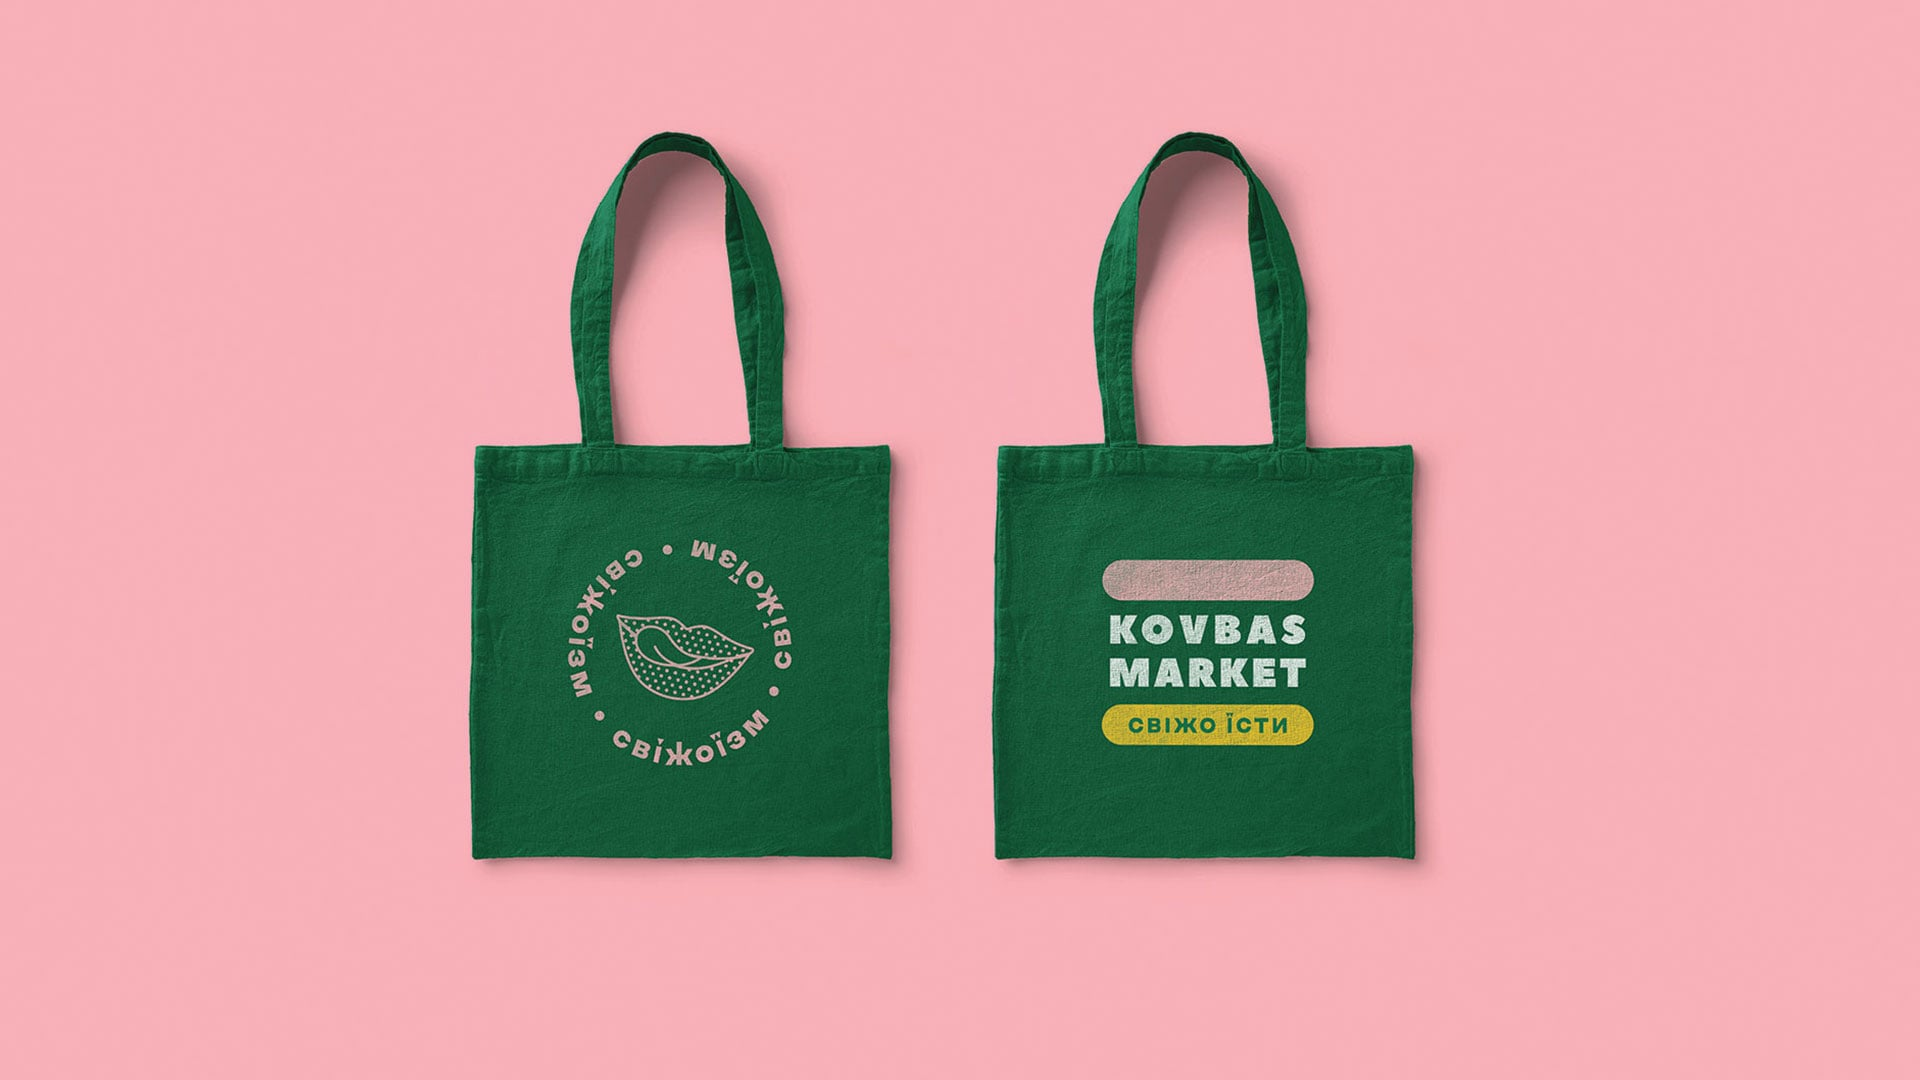 gra brand design kovbas market 14